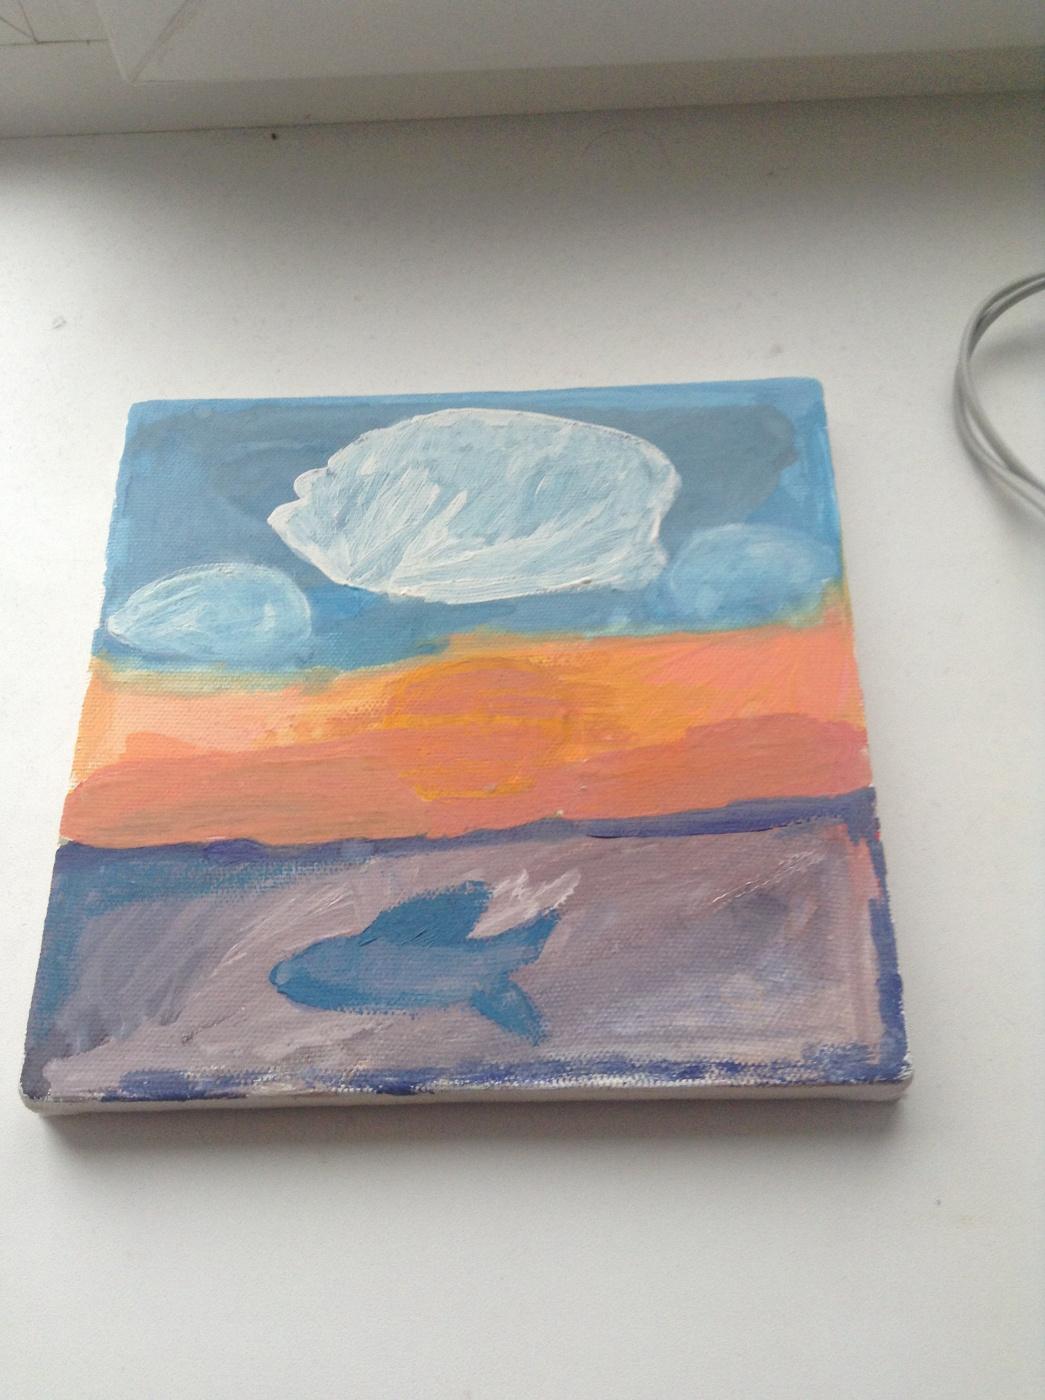 Amateur Draw. Fish at sunset